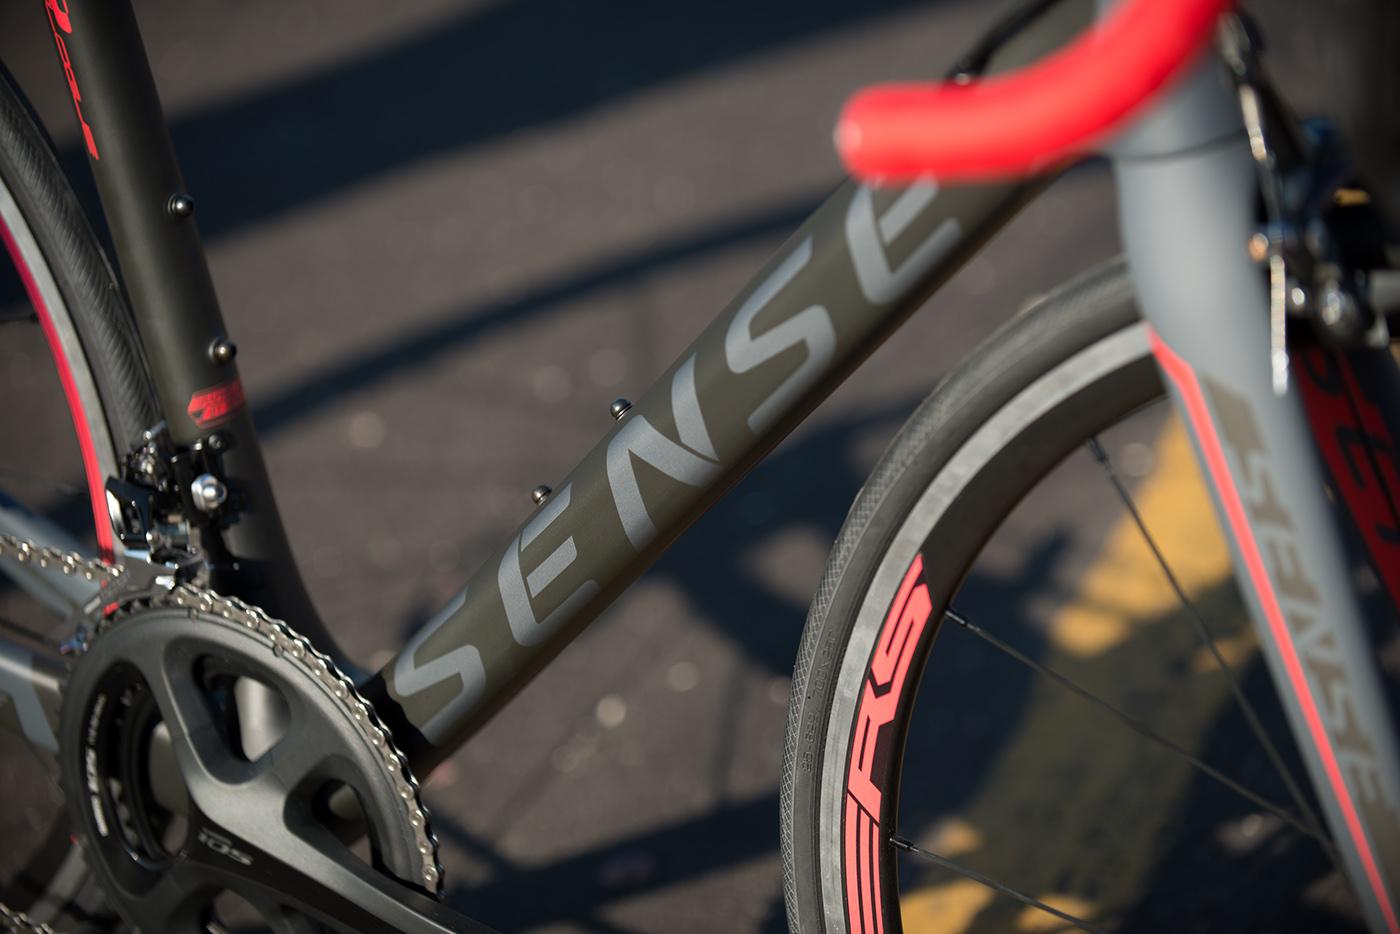 Gabriel Delfino Delfino Design carbon bike carbon Bike Bicycle cycle Design Brasileiro road bike MTB